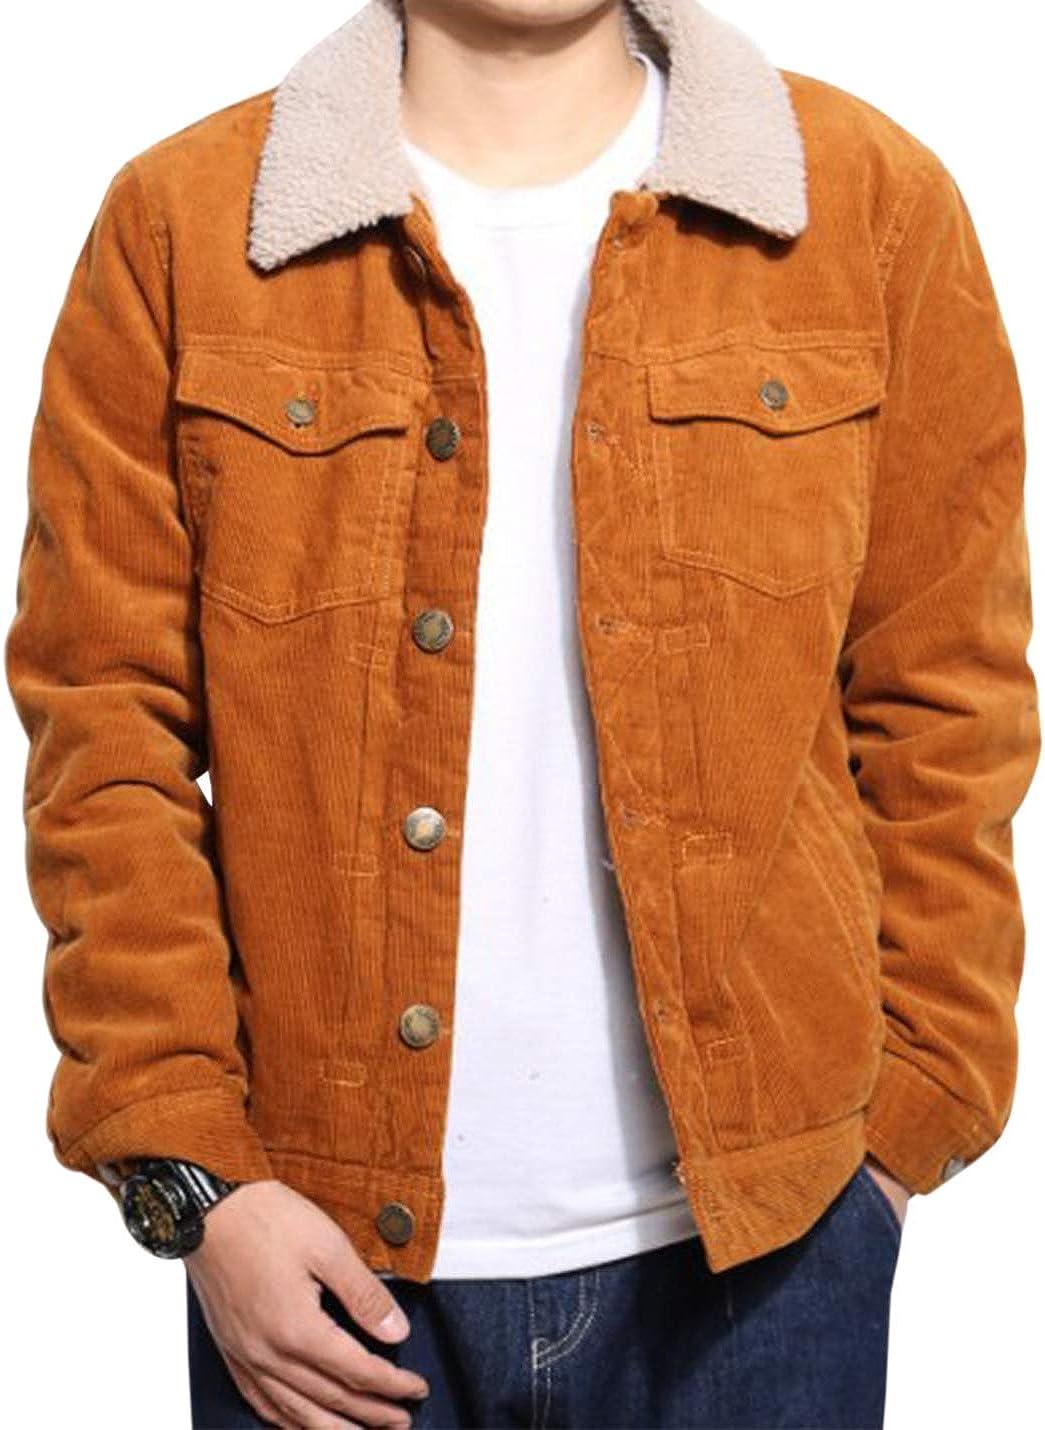 Gihuo Men's Sherpa Fleece Lined Corduroy Jacket with Fur Collar (Khaki, Small)